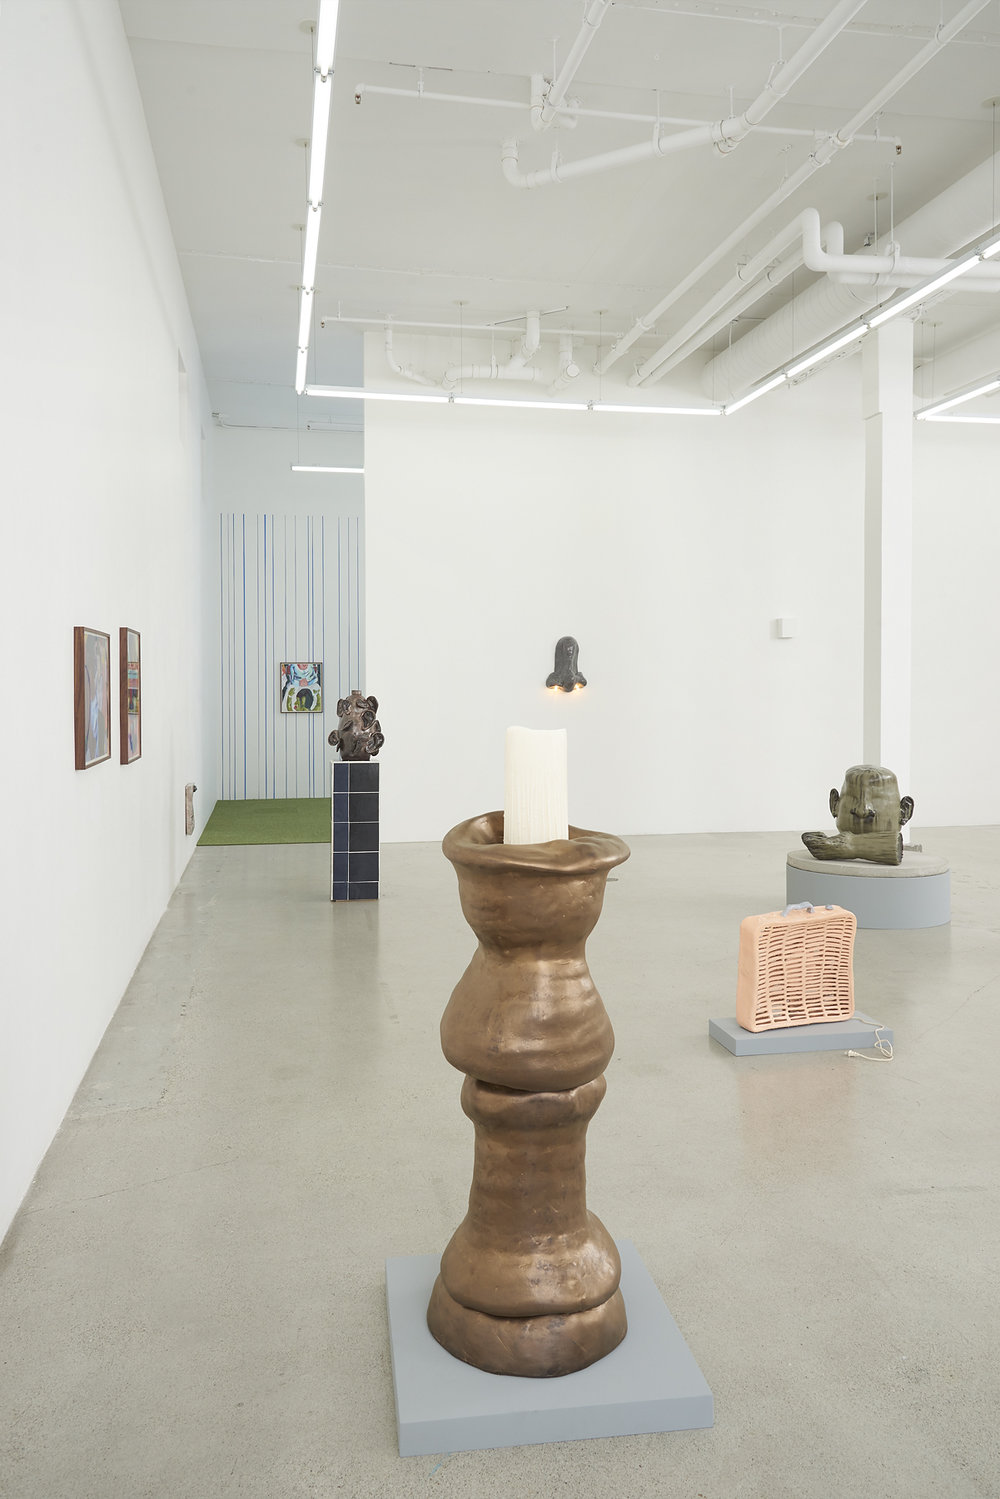 Othello_Living Room, 2018_Jessica Silverman Gallery_Installation view 11.PRS.jpg